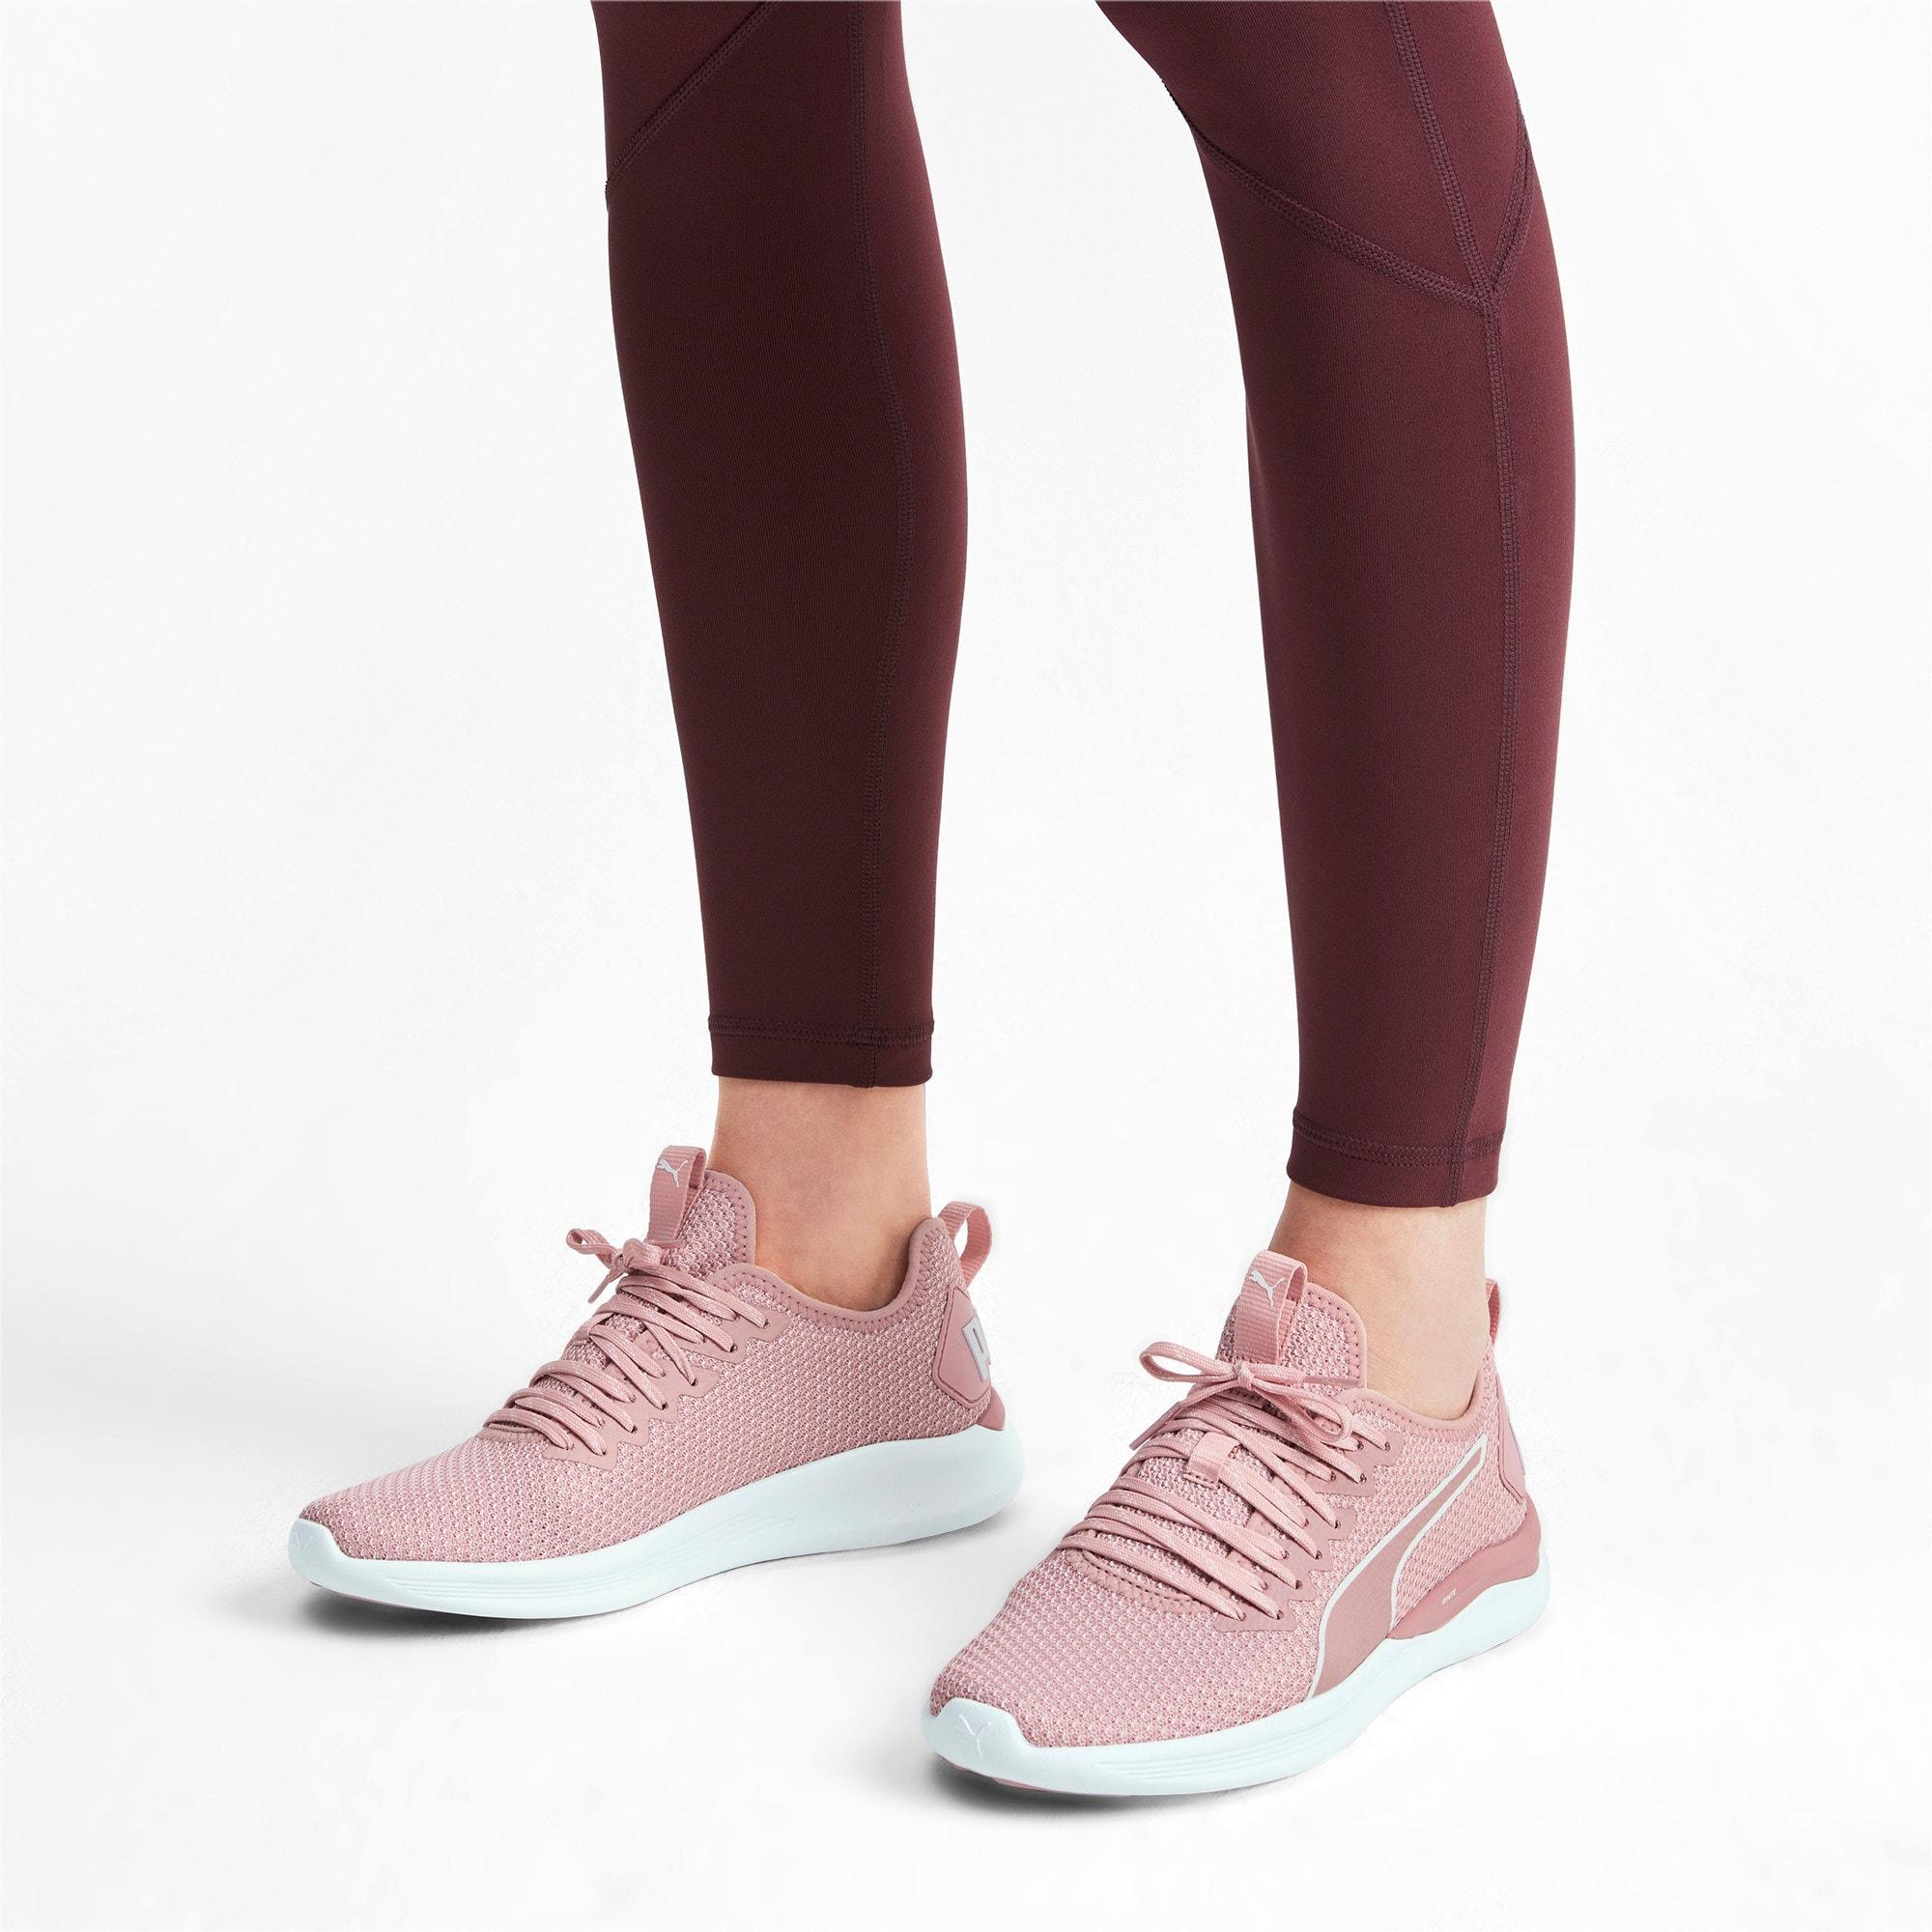 Thumbnail 3 of IGNITE Flash Women's Training Shoes, Bridal Rose-Puma White, medium